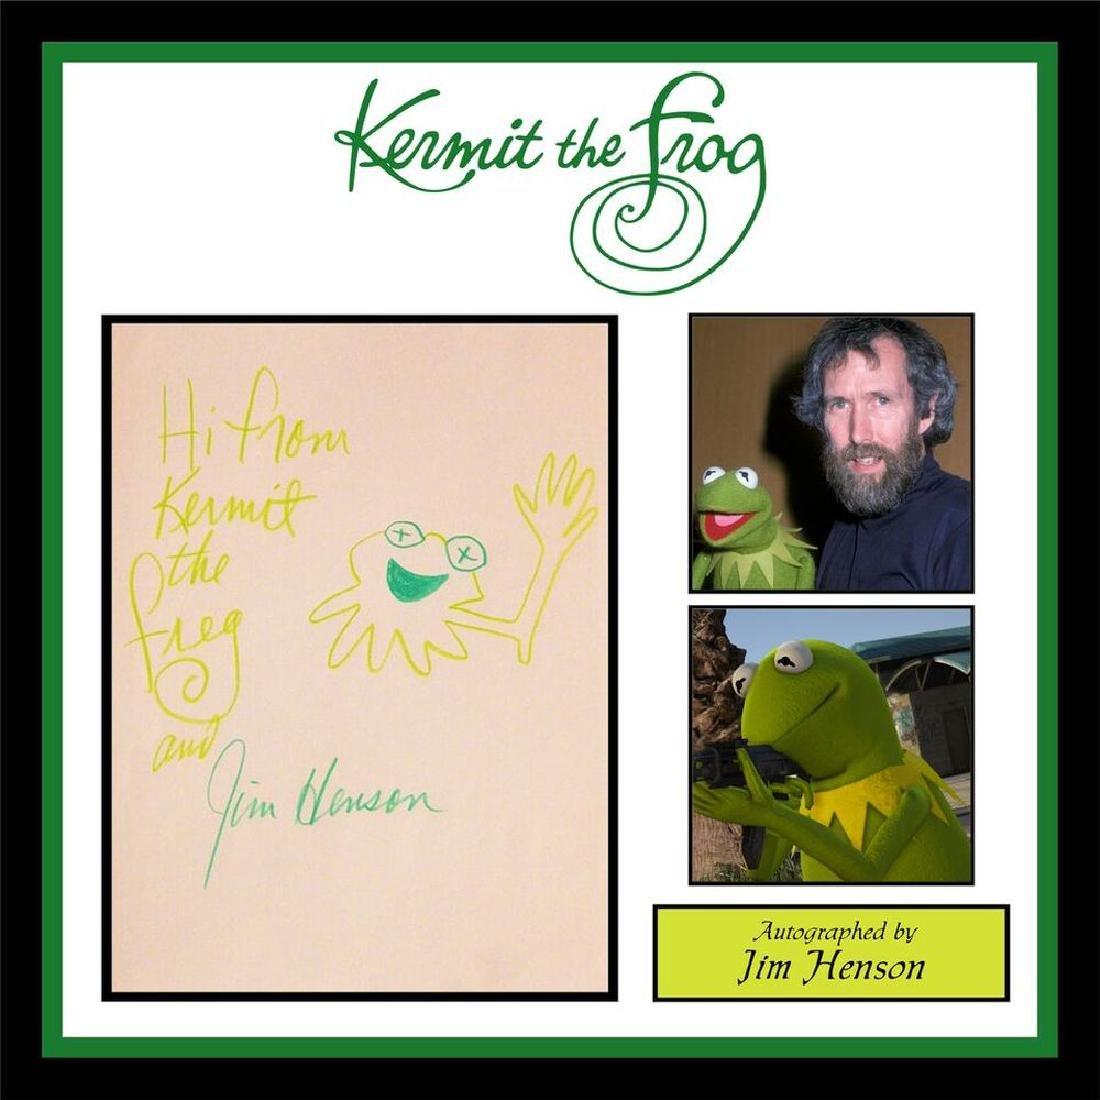 Drawing by Jim Henson of Kermit Saying 'Hi From Kermit